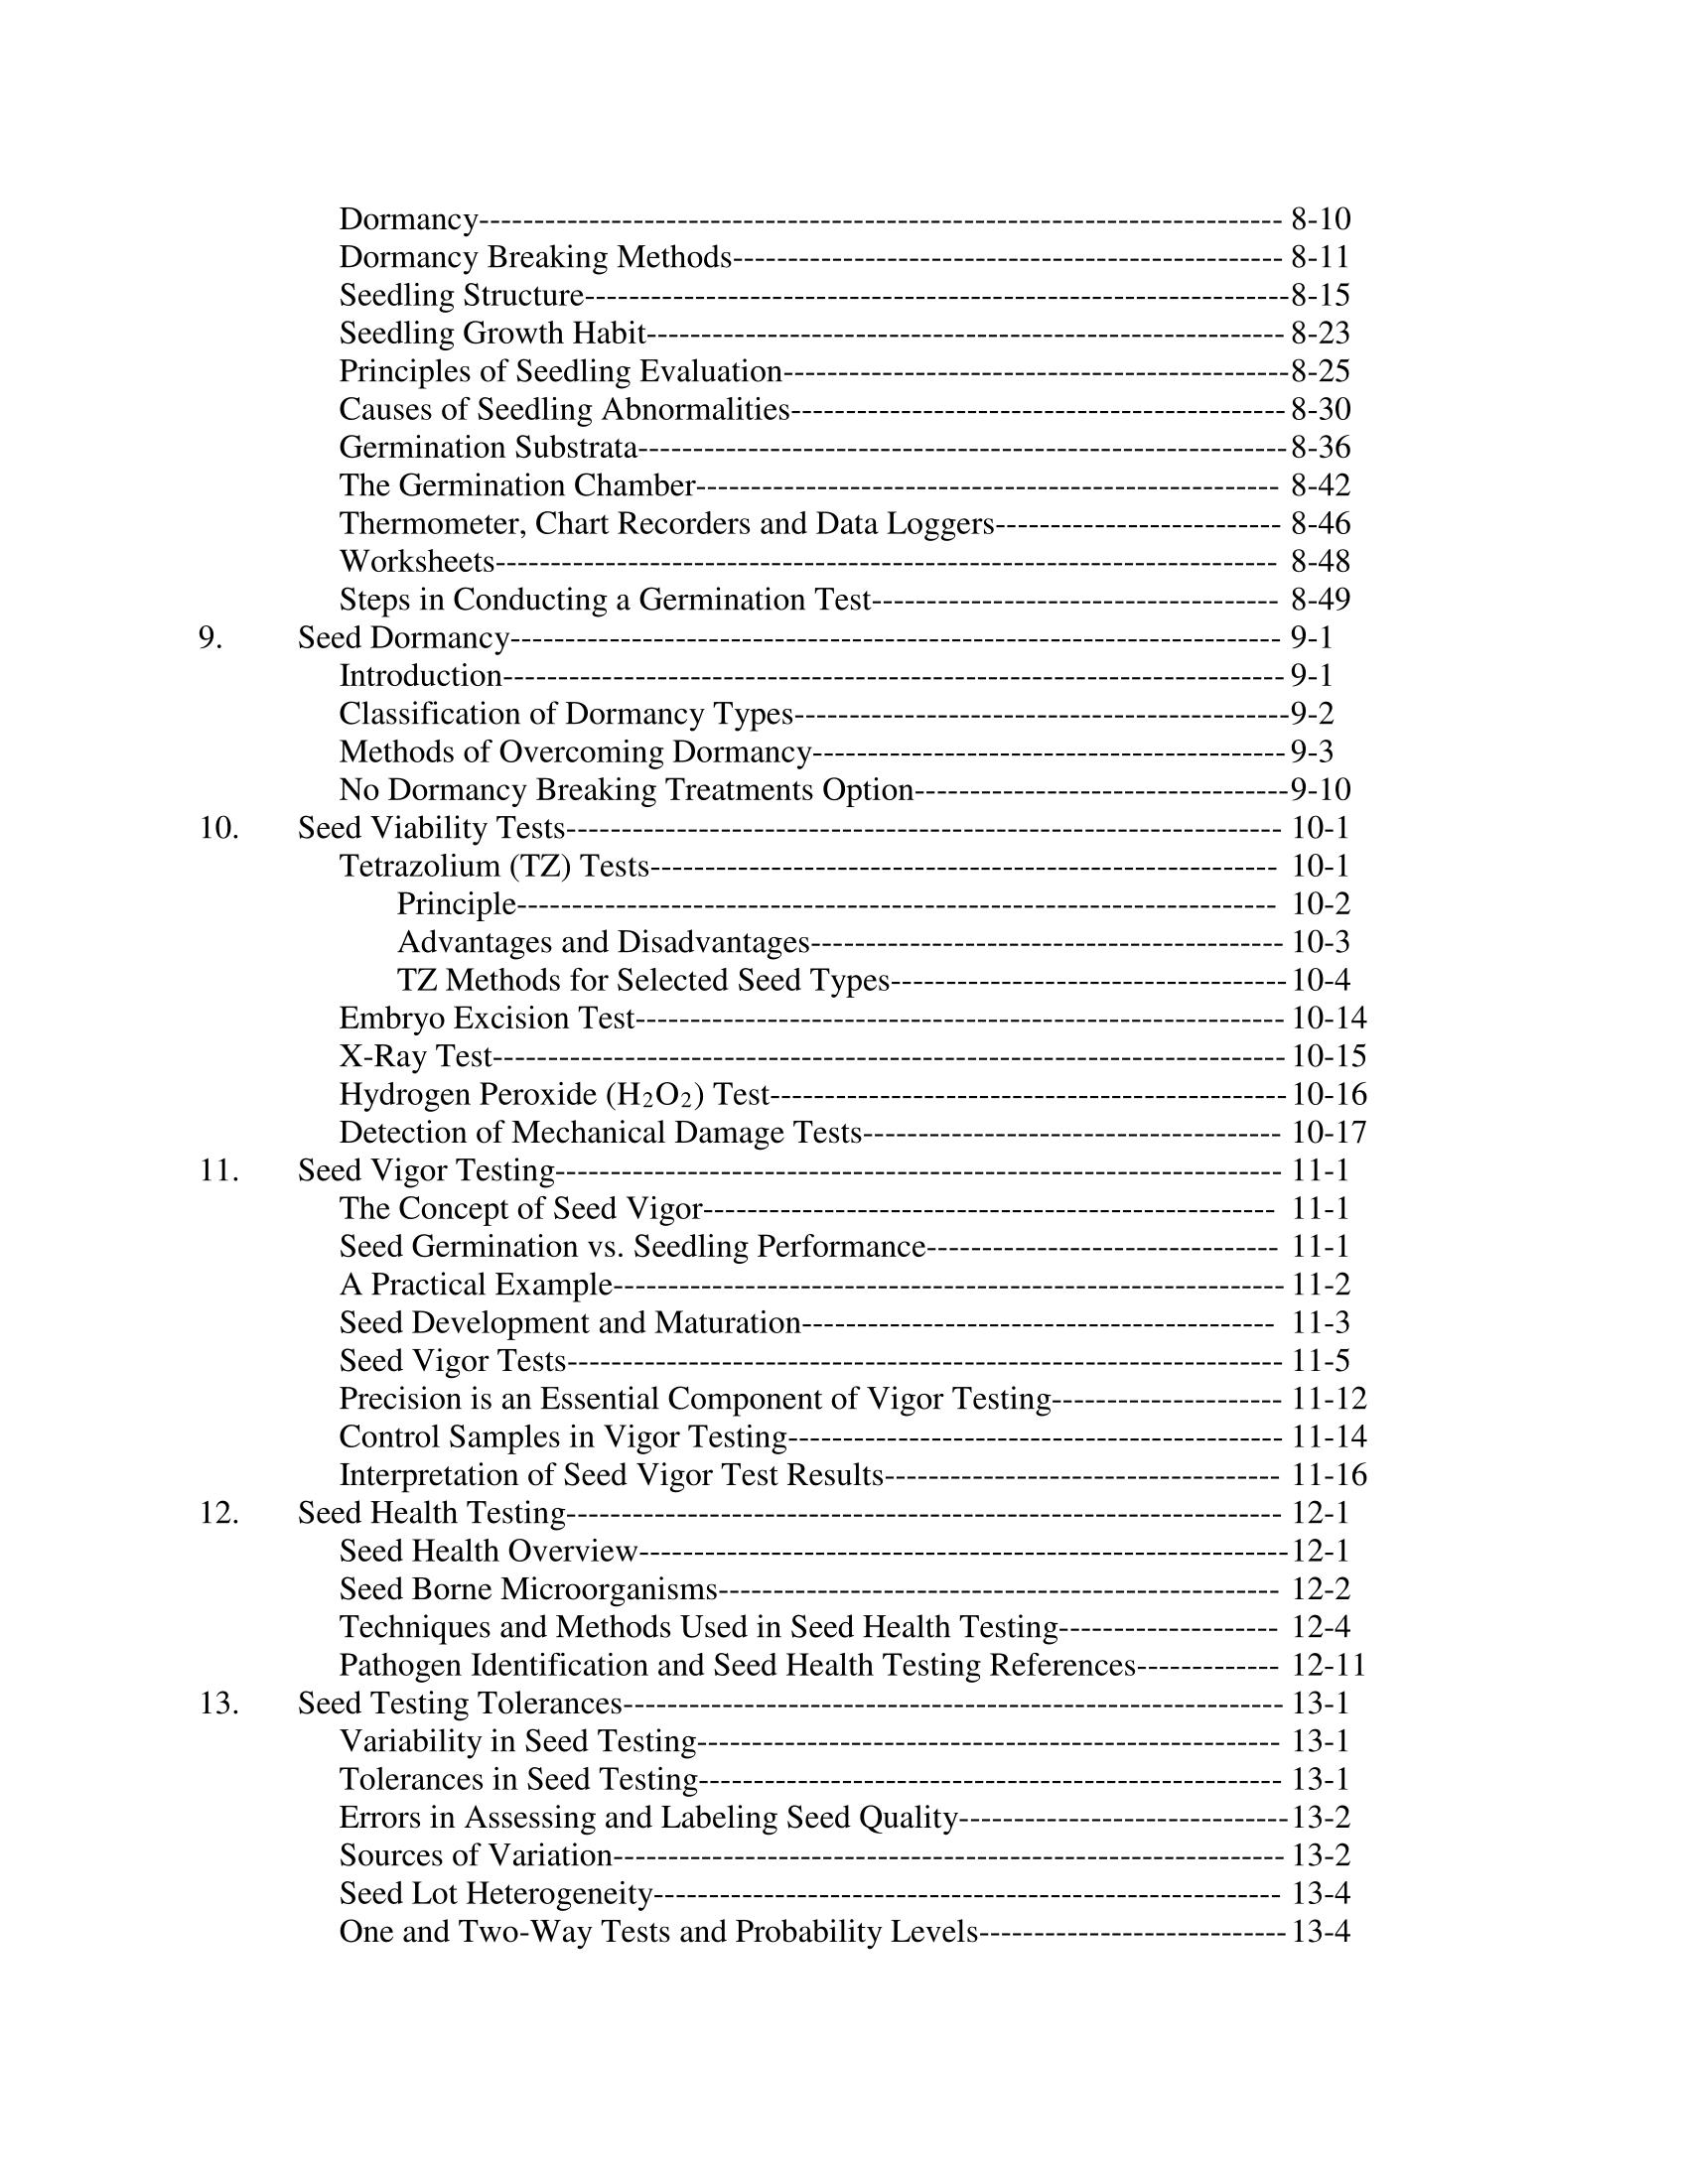 Seed Technologist Training Manual, 2018